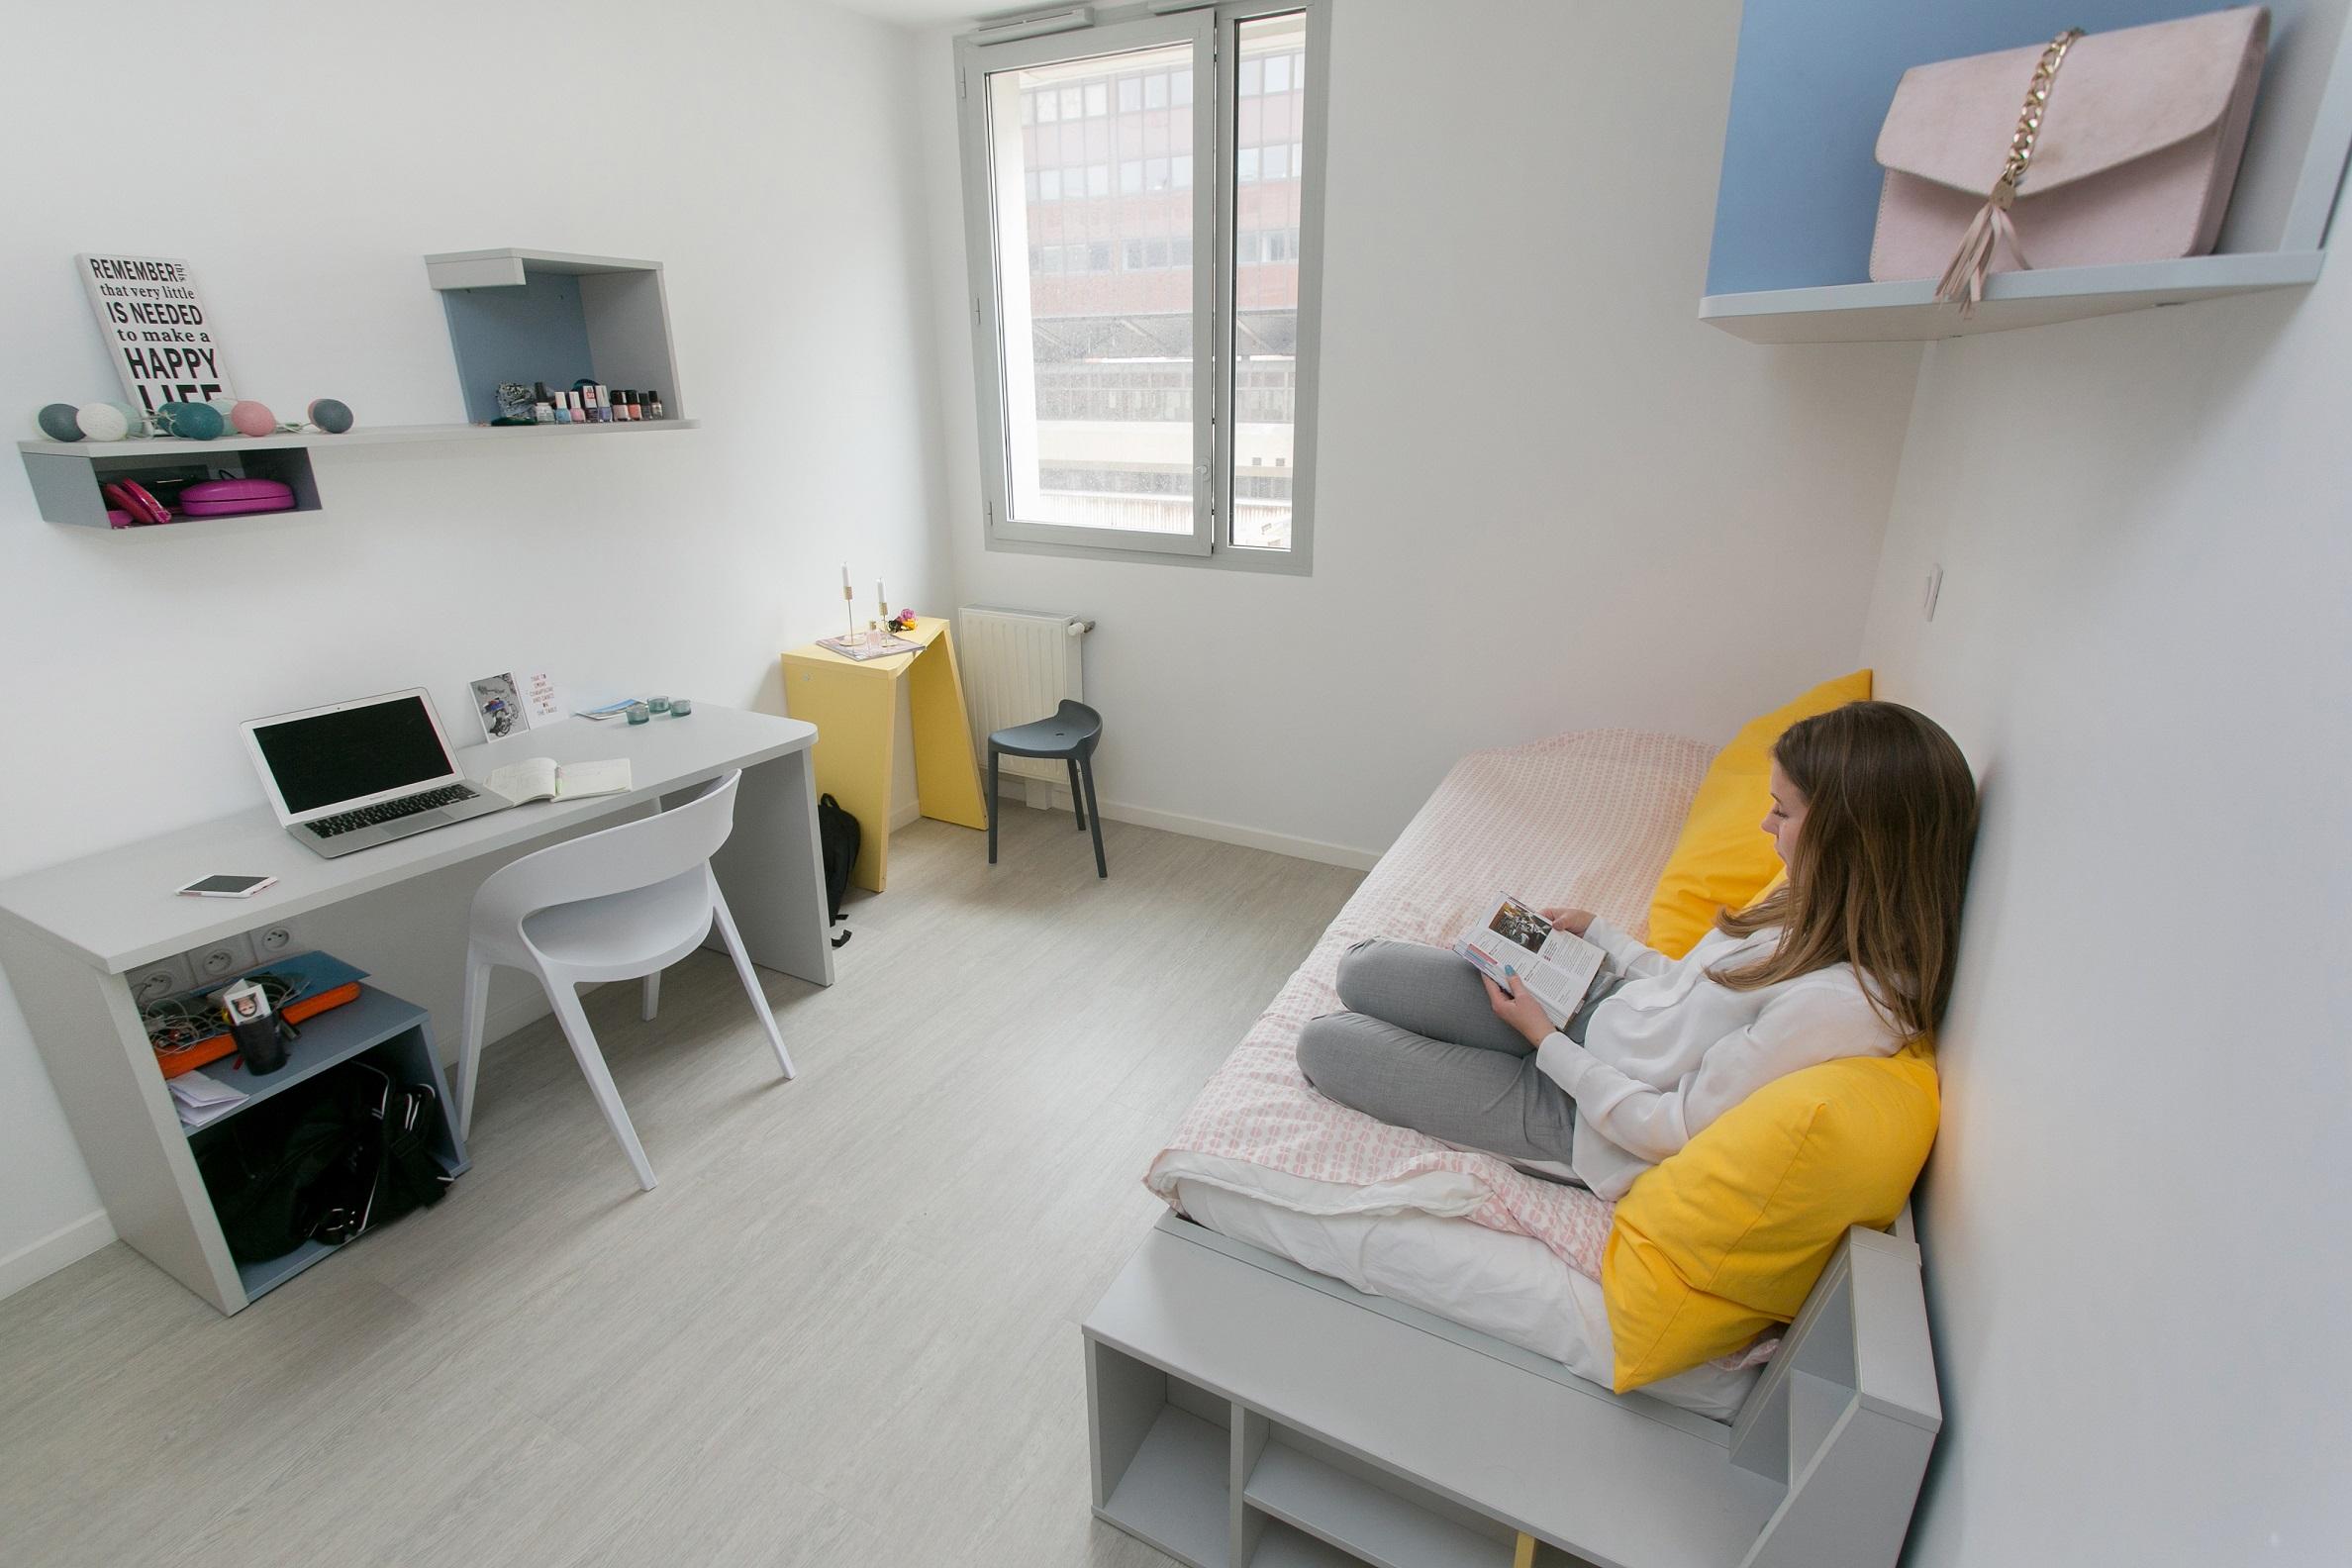 Location CAMPUSEA - CAMPUSEA MARSEILLE LA MAJOR - Marseille   02ème arrondissement (13002)